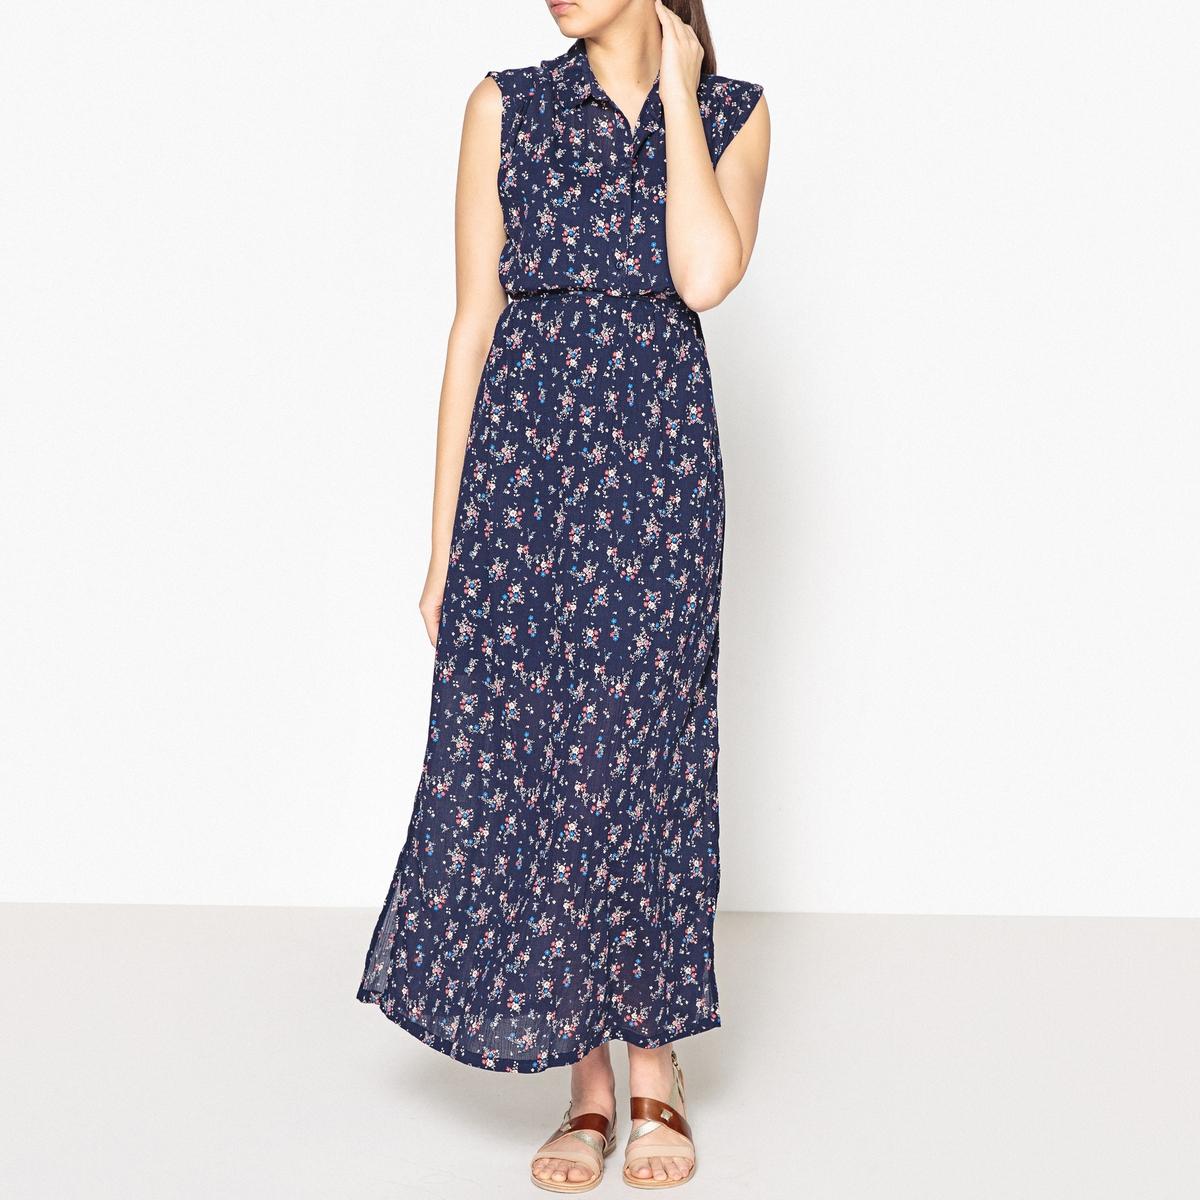 Платье длинное с рисунком, без рукавов, LILOYE